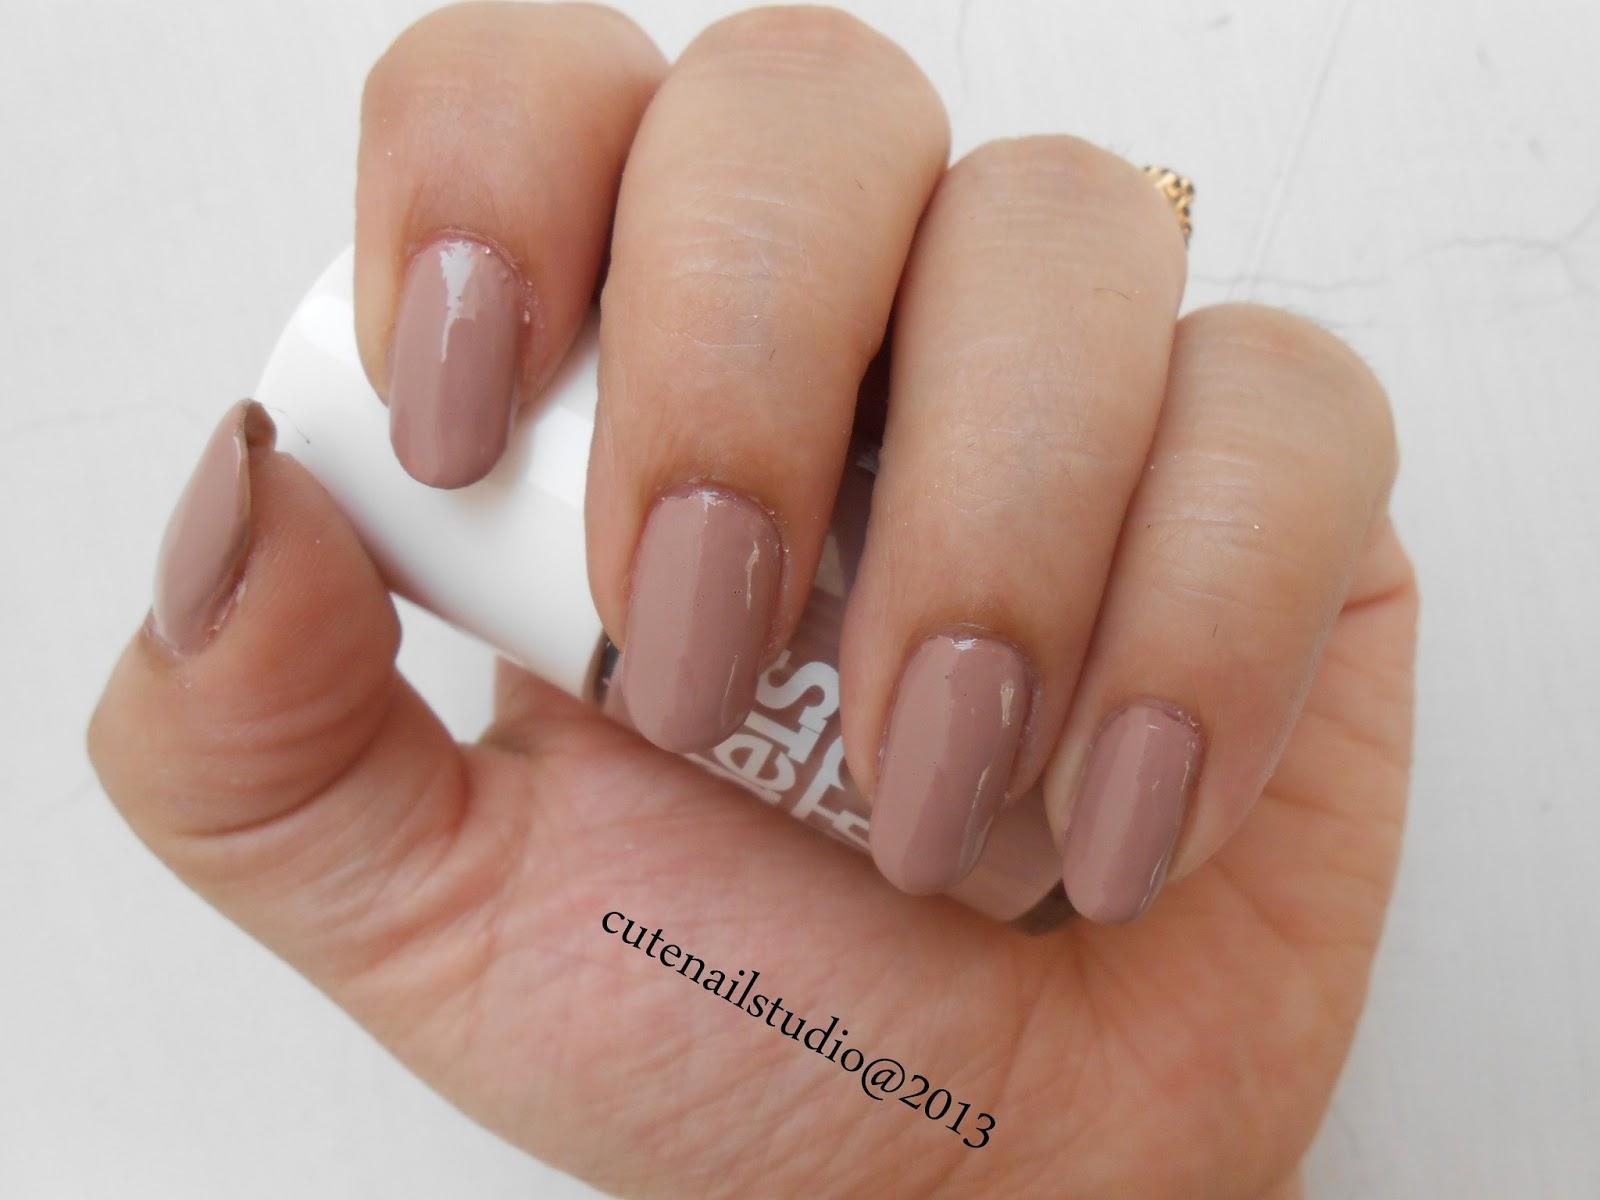 Cute nails: Models own N*de Beige swatch and Jordana Bronze fest